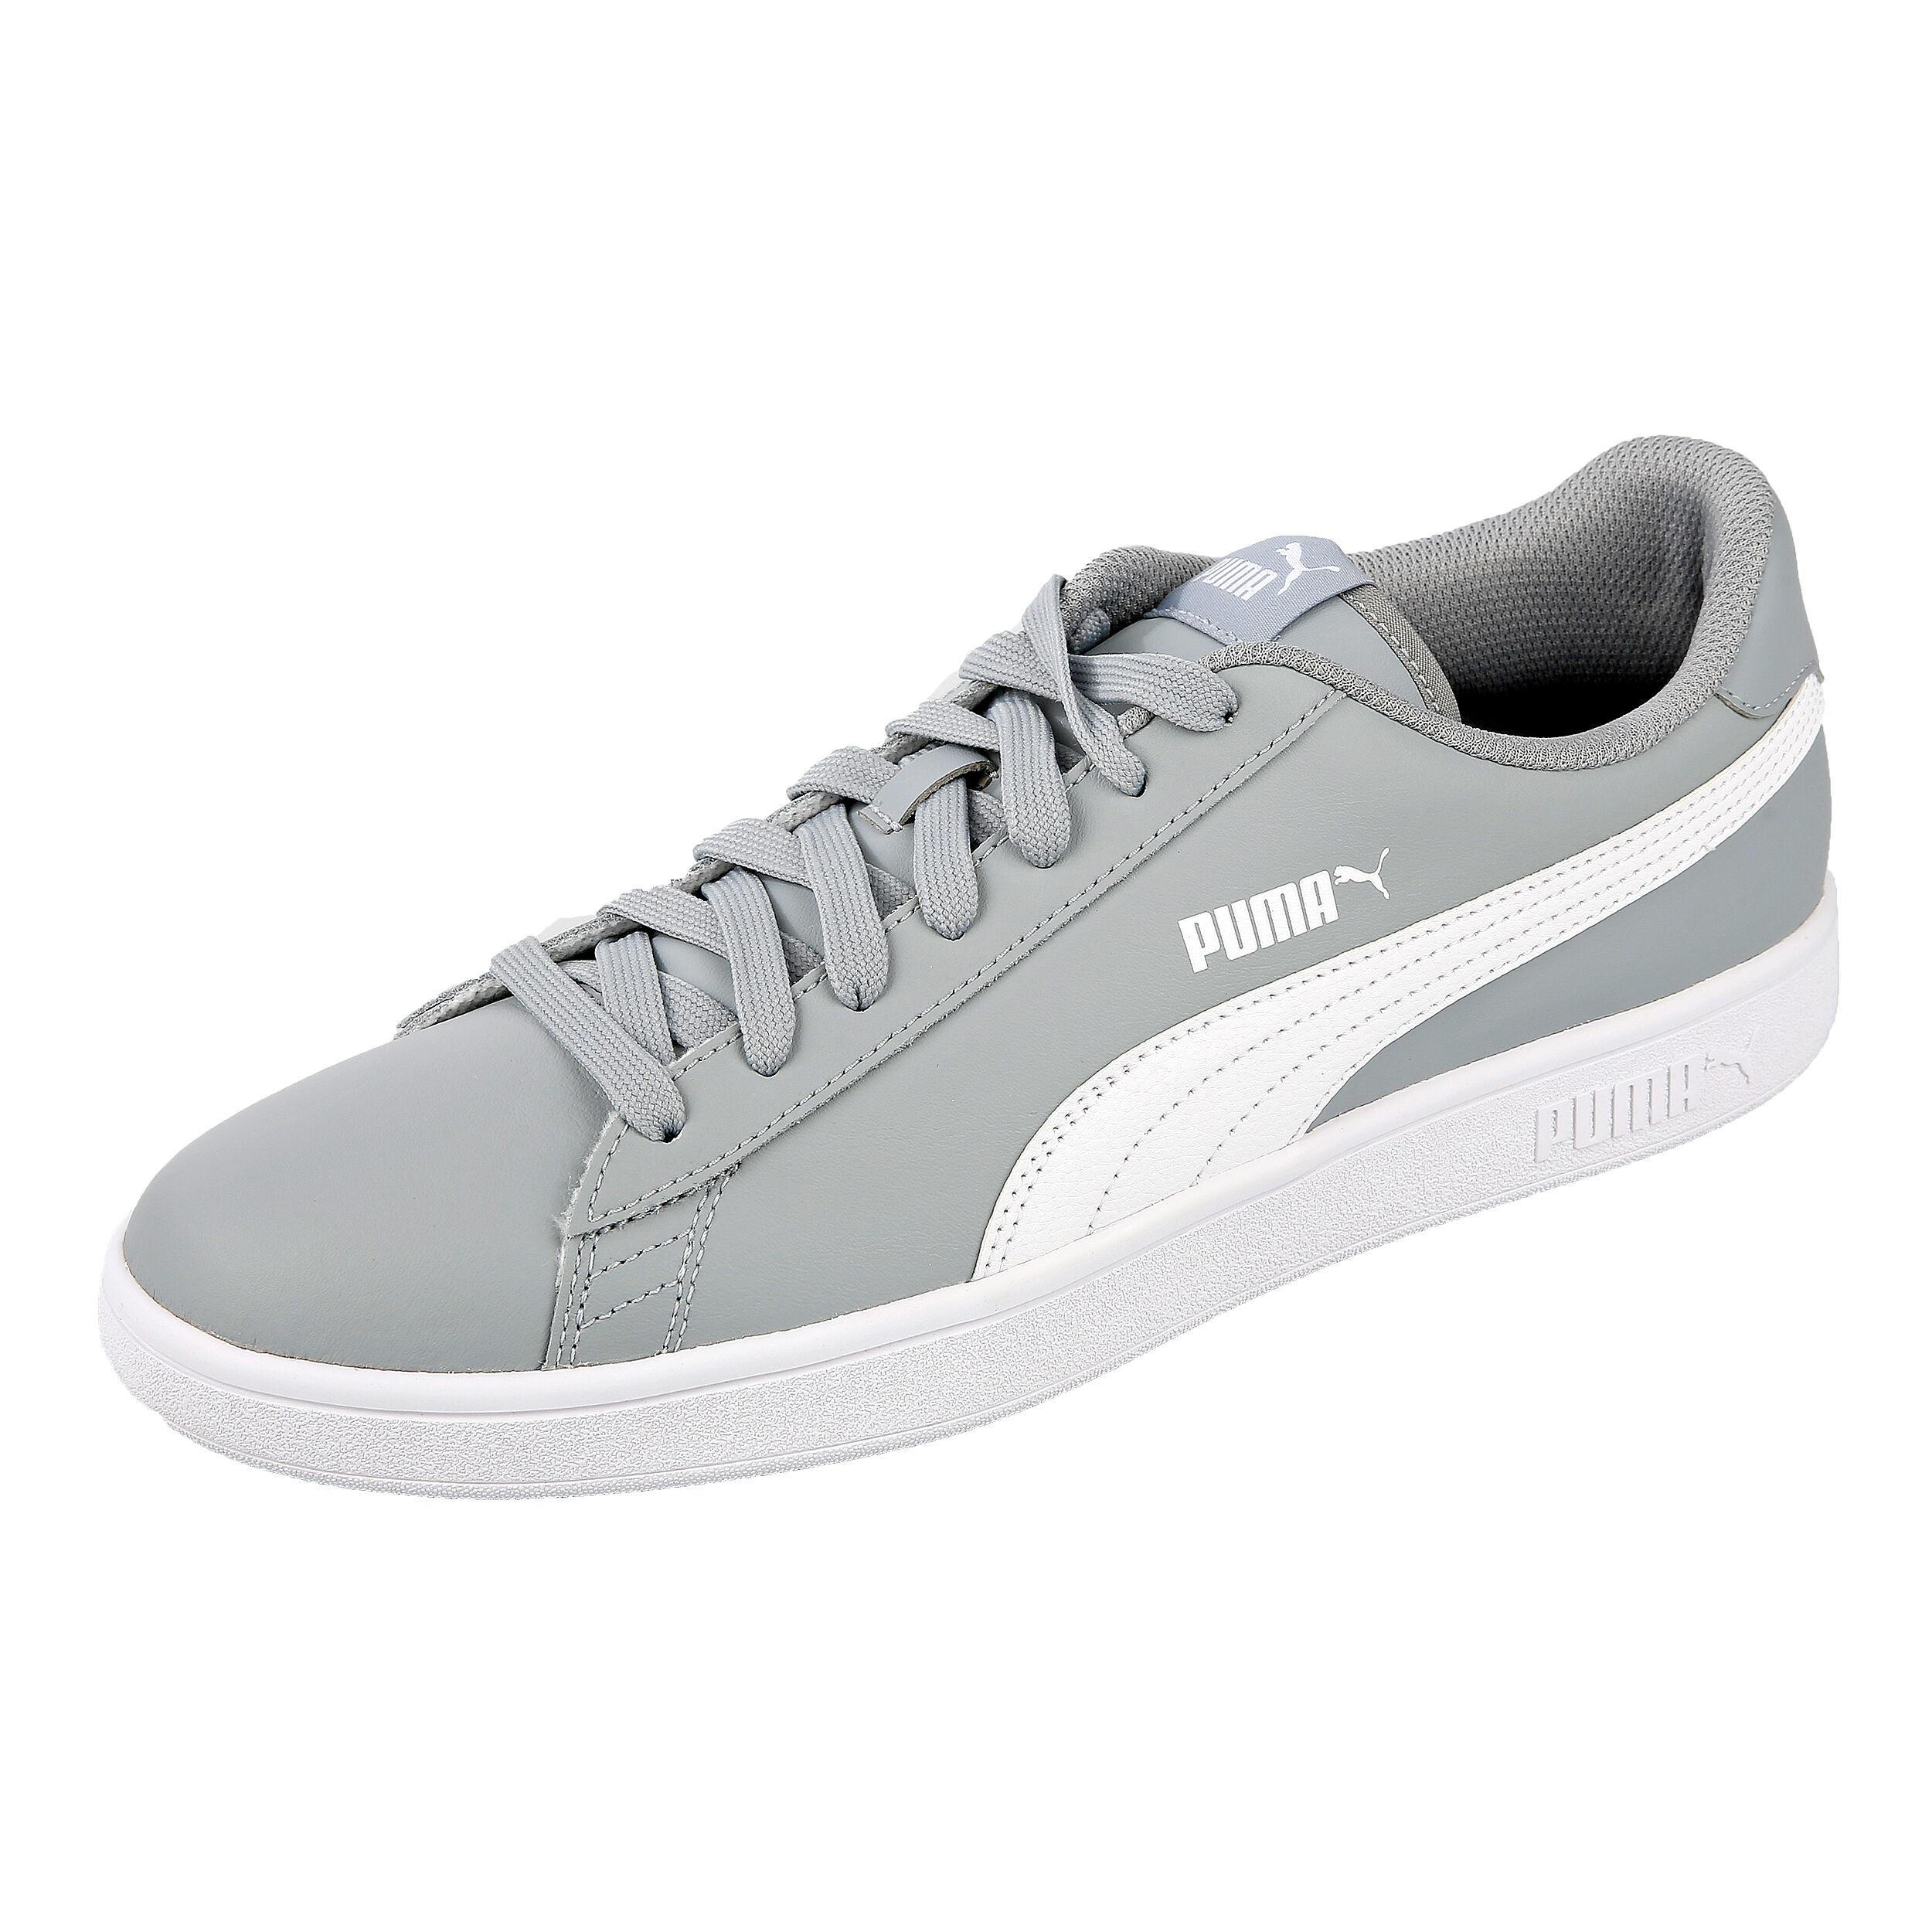 Onlinepoint Da Tennis Compra Scarpe Puma 4ql5rjac3 sxdhrtQCB